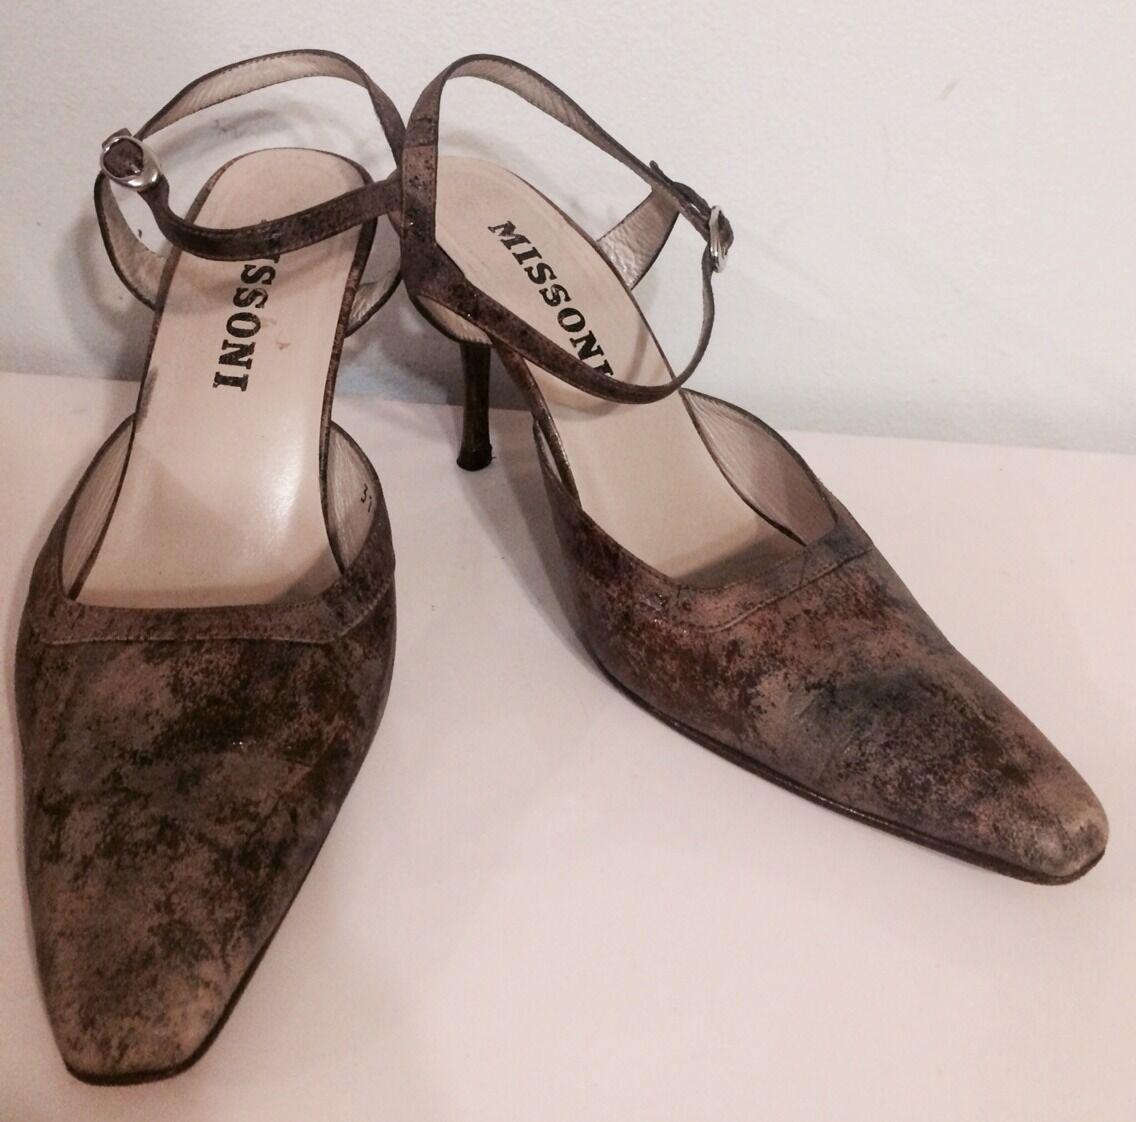 Missoni Slingbacks Sandale Ankle Strap Heel 3'' Schuhes Braun Leder Sz 36